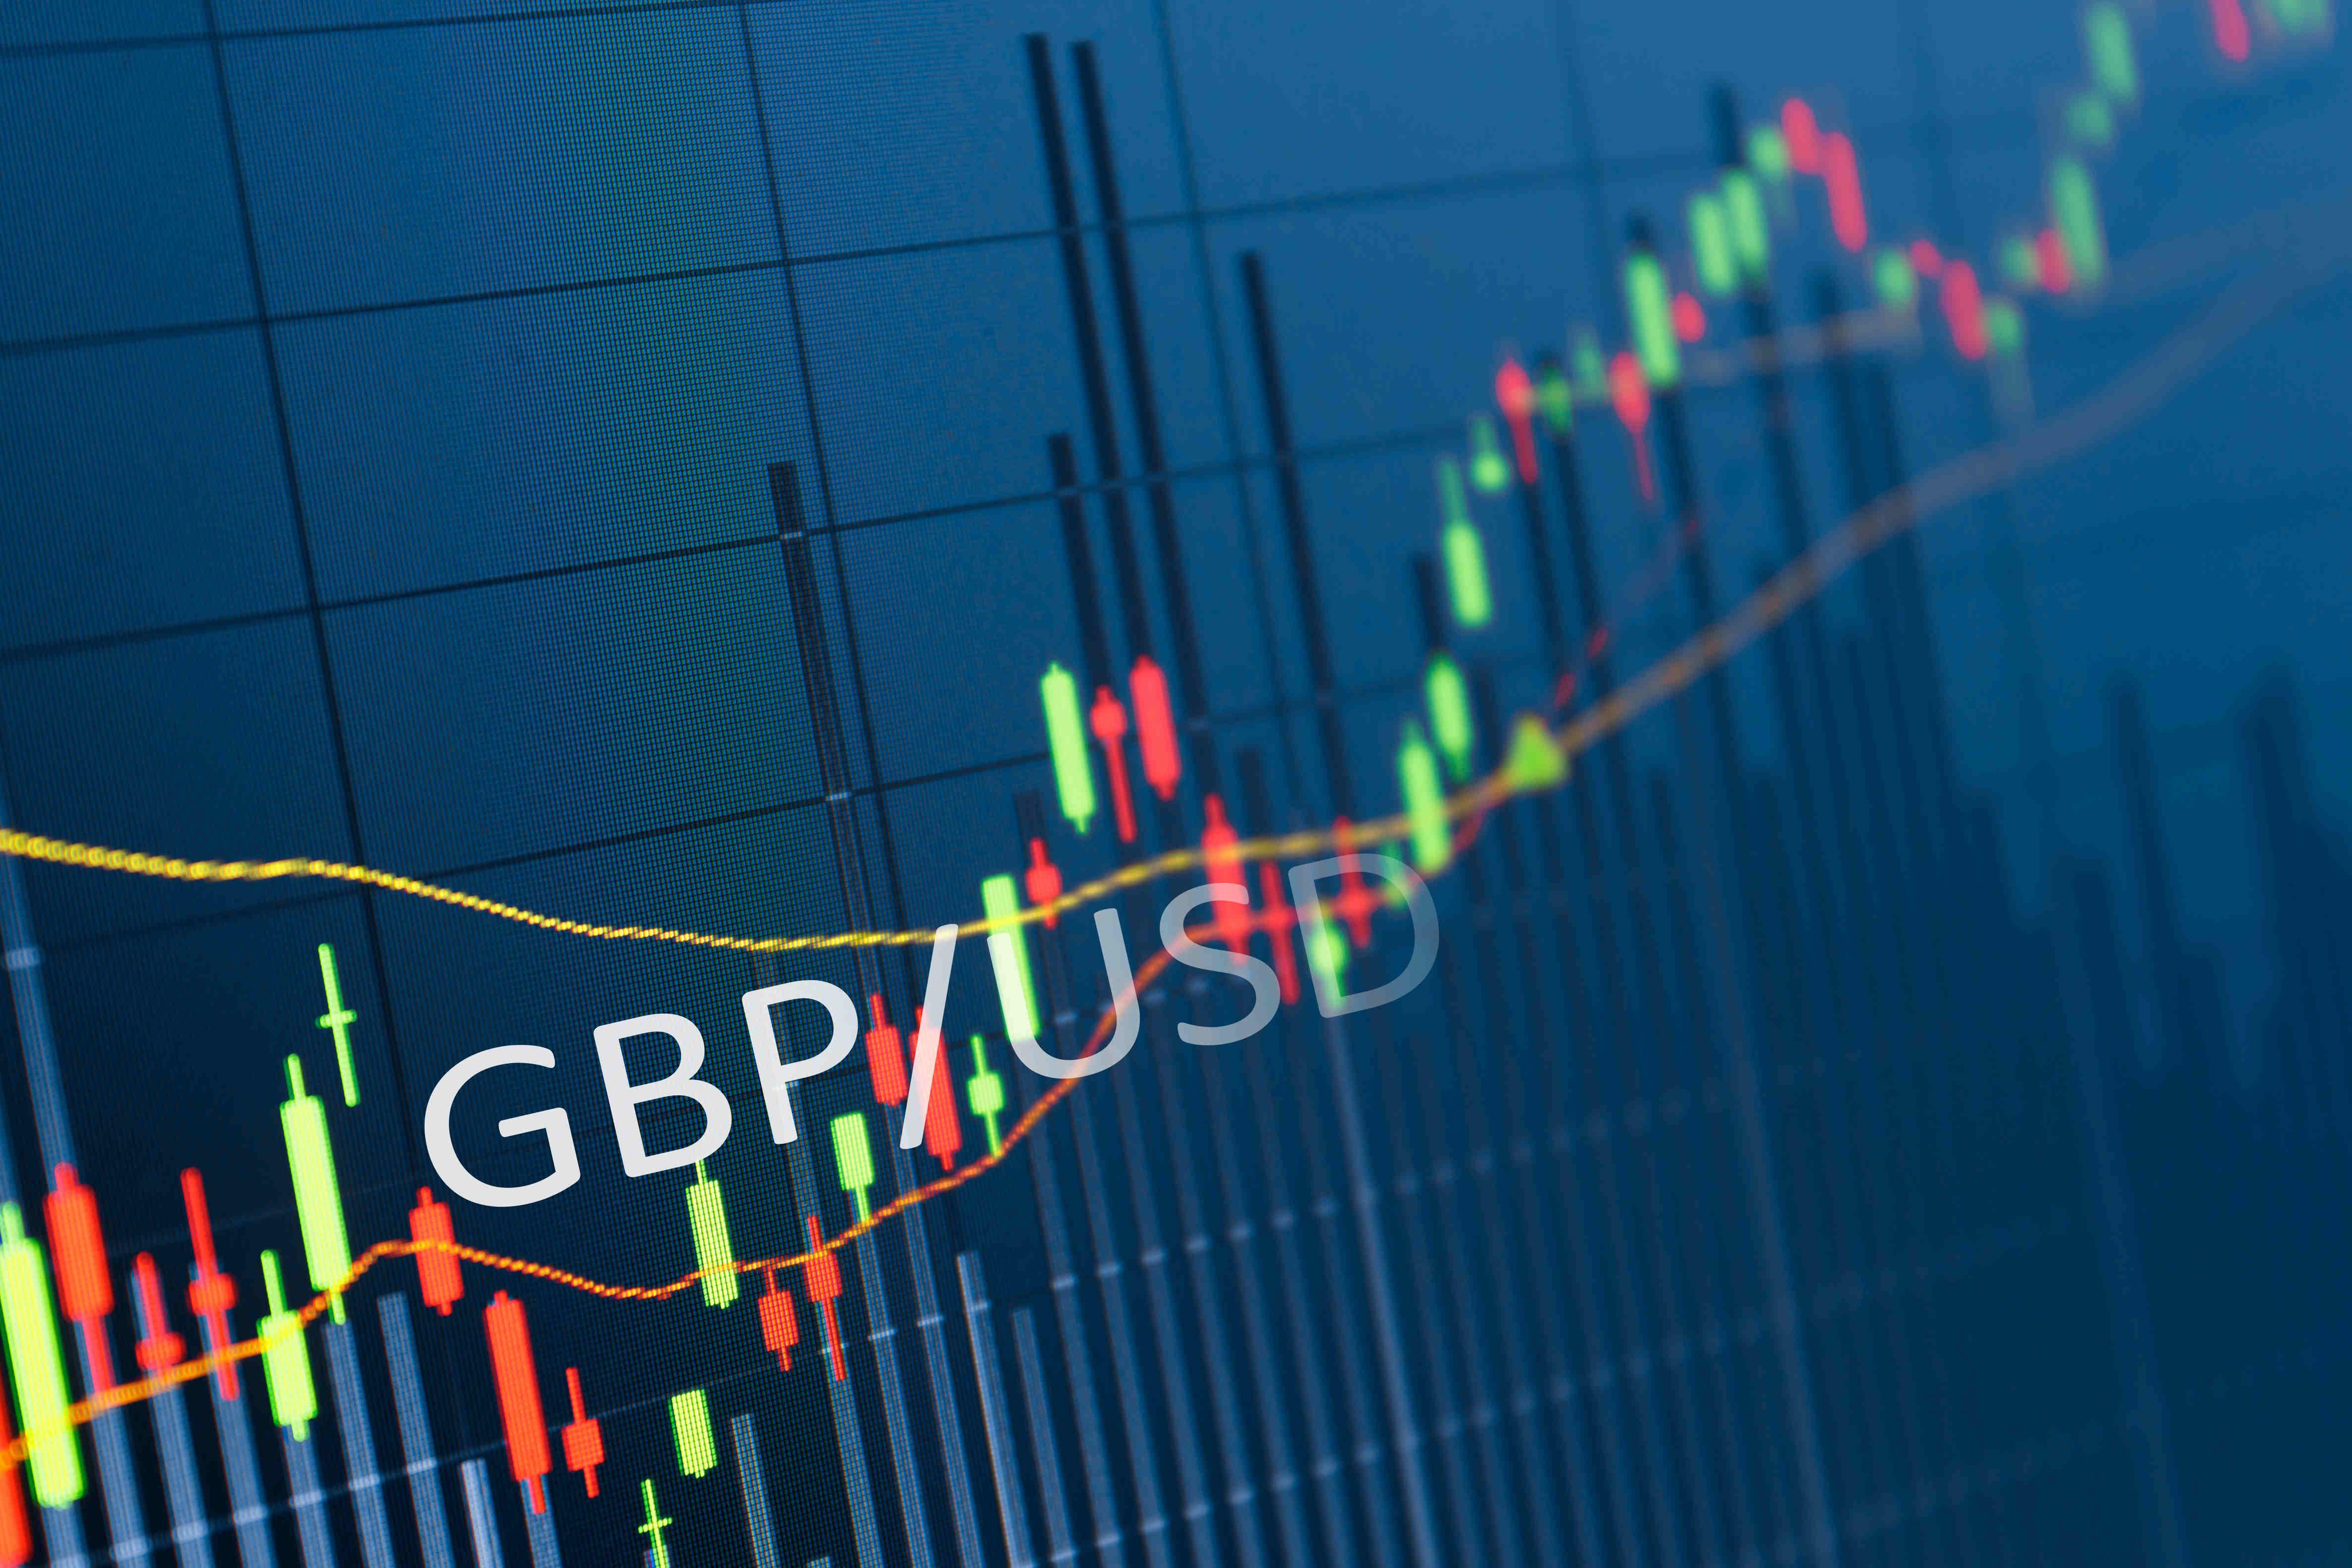 Tendencial del GBPUSD